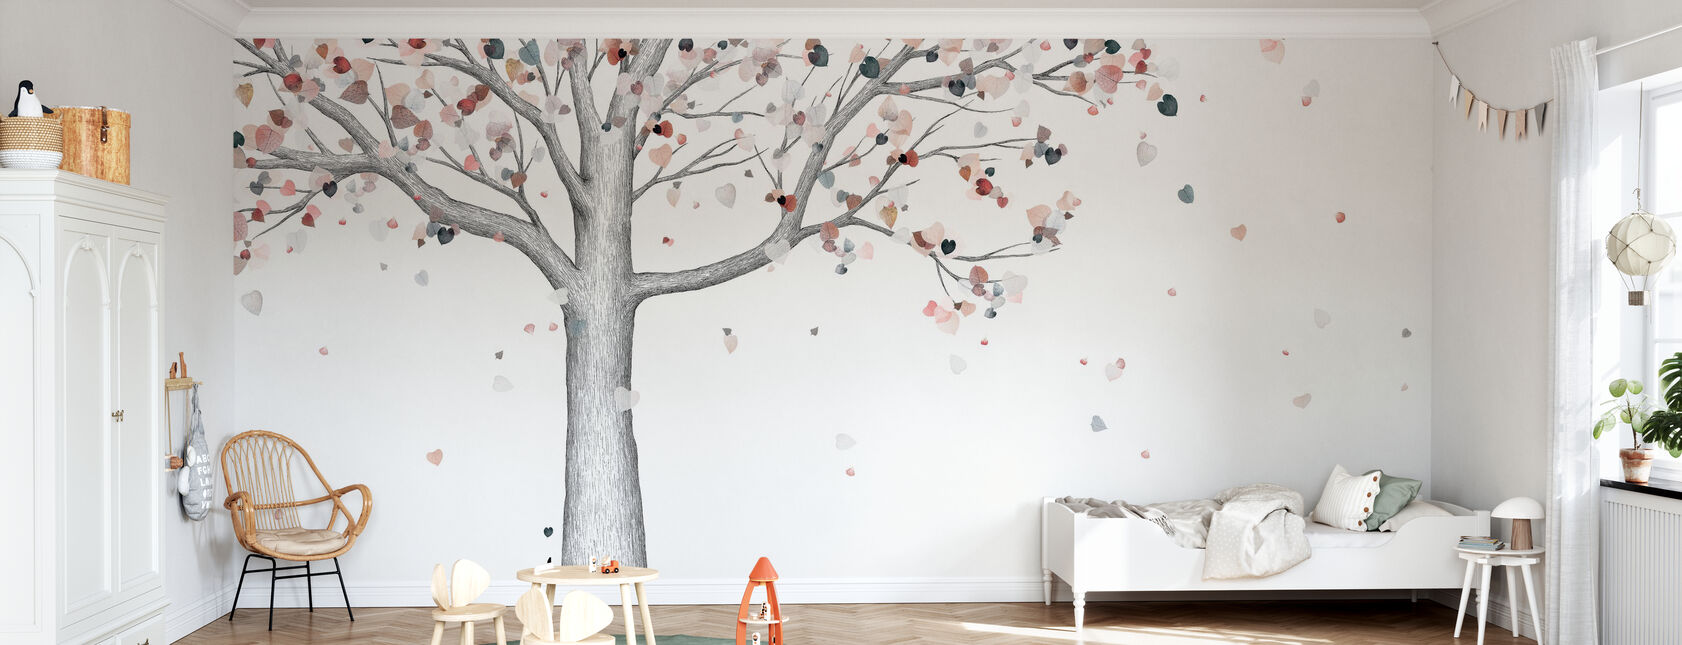 Autumn - Wallpaper - Kids Room